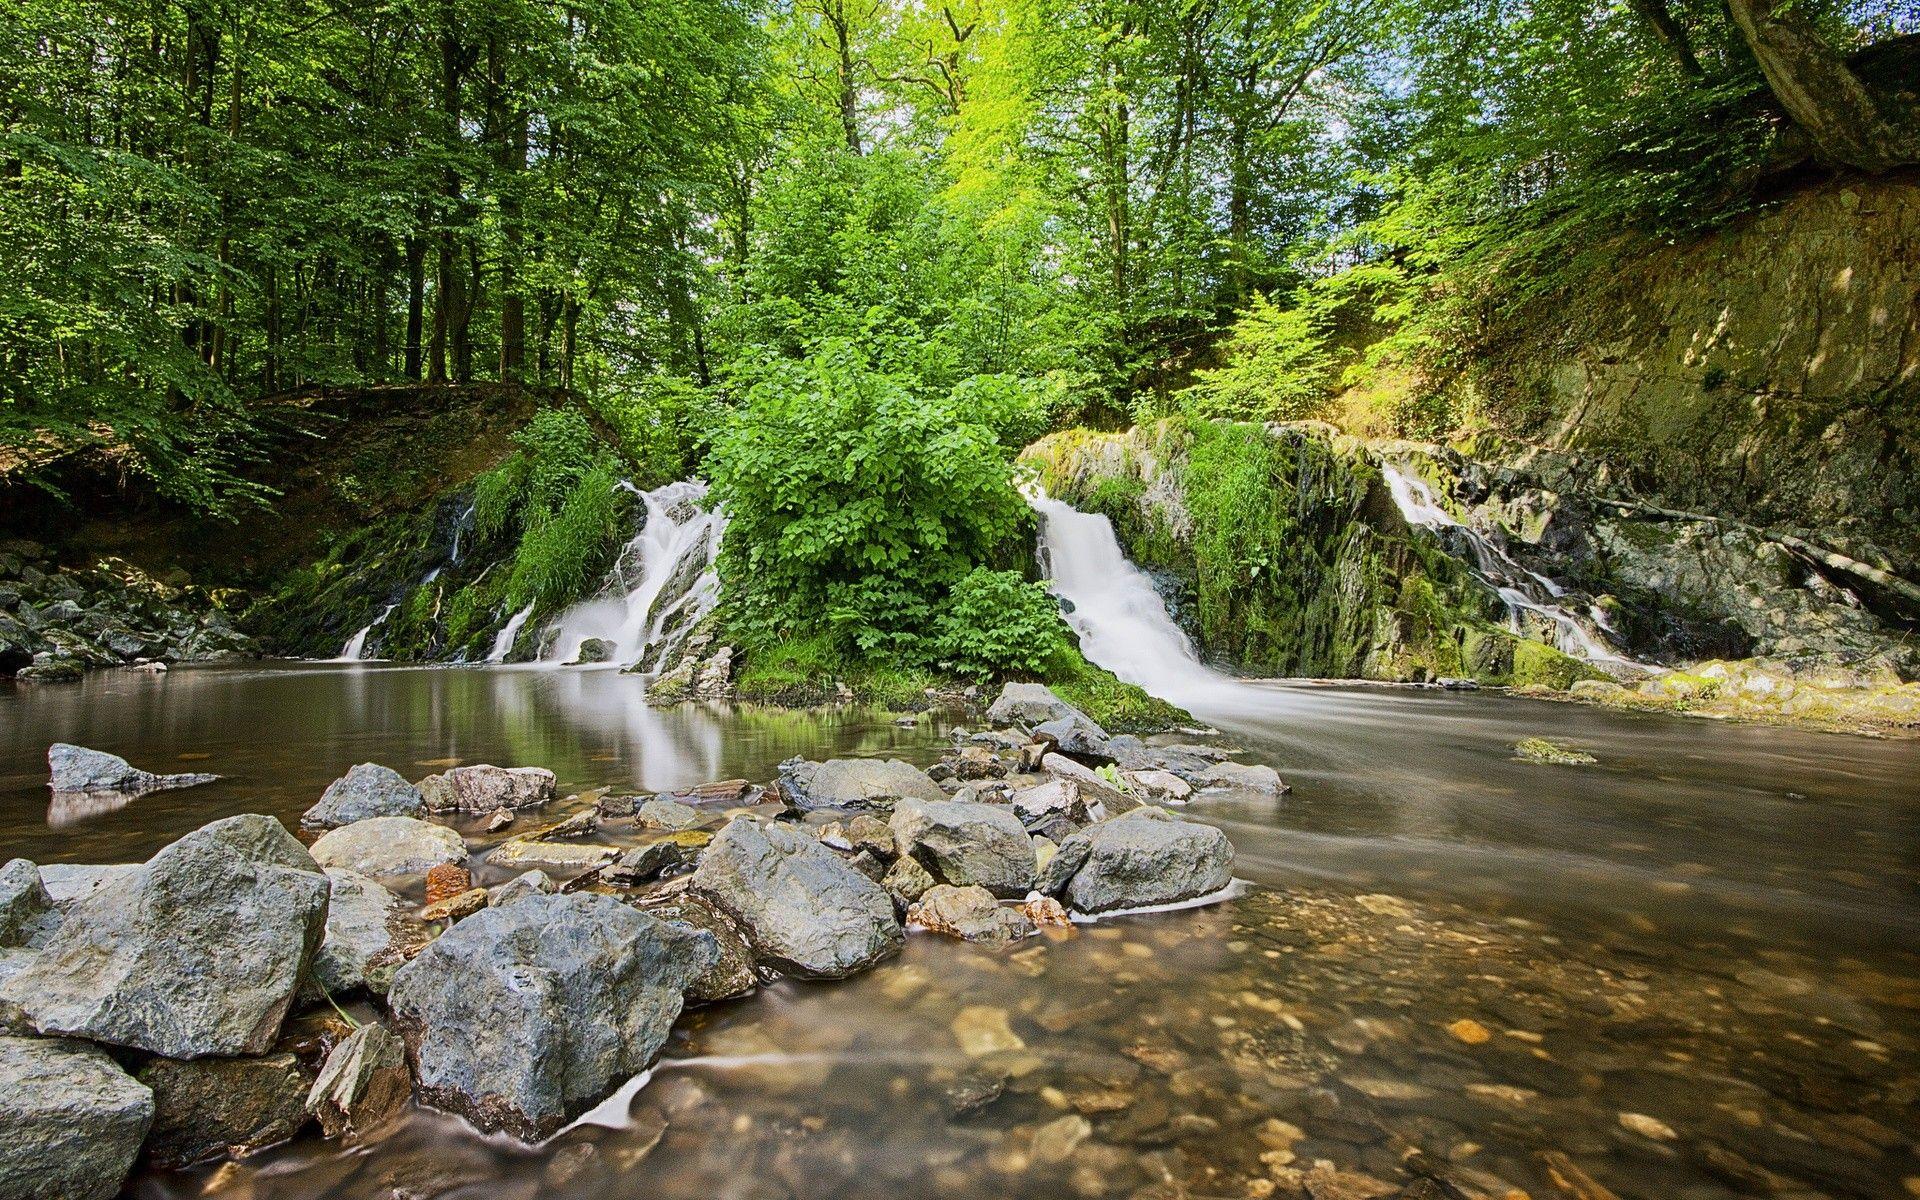 Stunning Waterfalls Hd Desktop Background Wallpapers Hd Free  501705